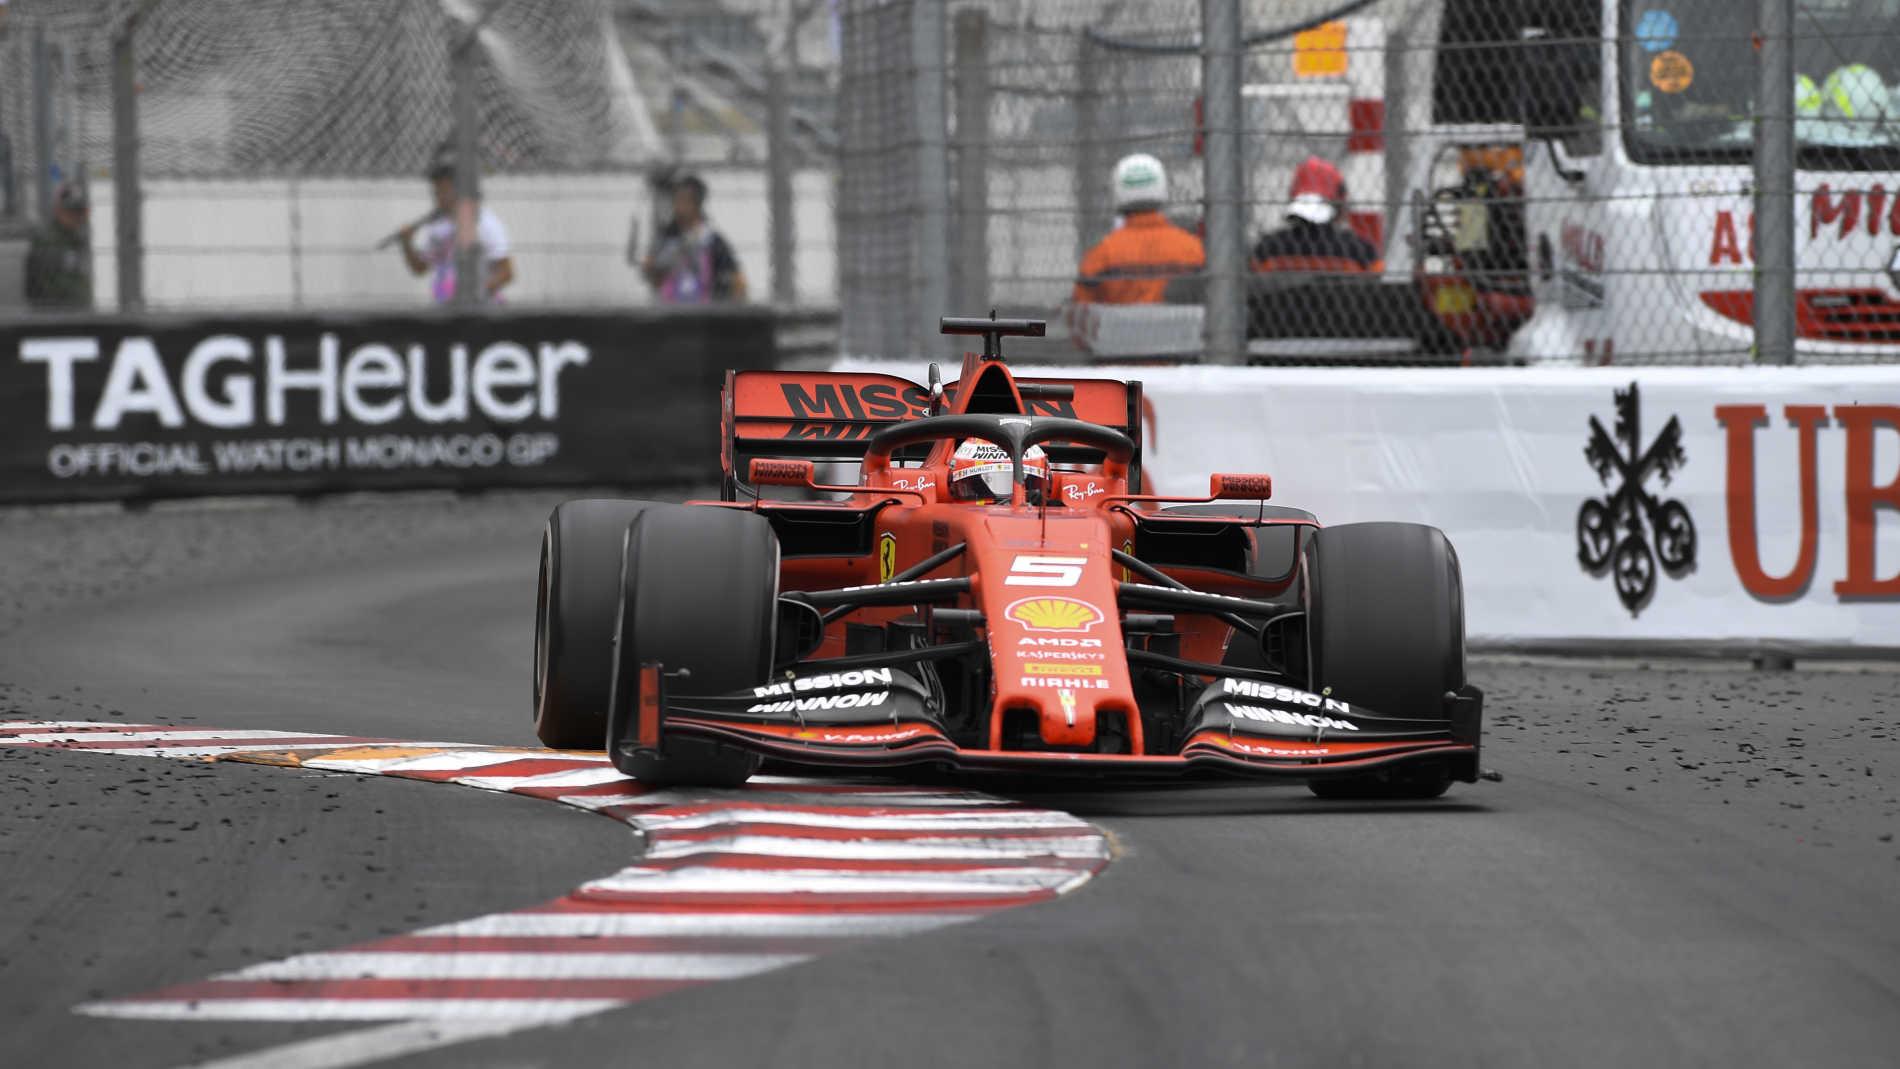 Imagini pentru Sebastian Vettel monaco 2019